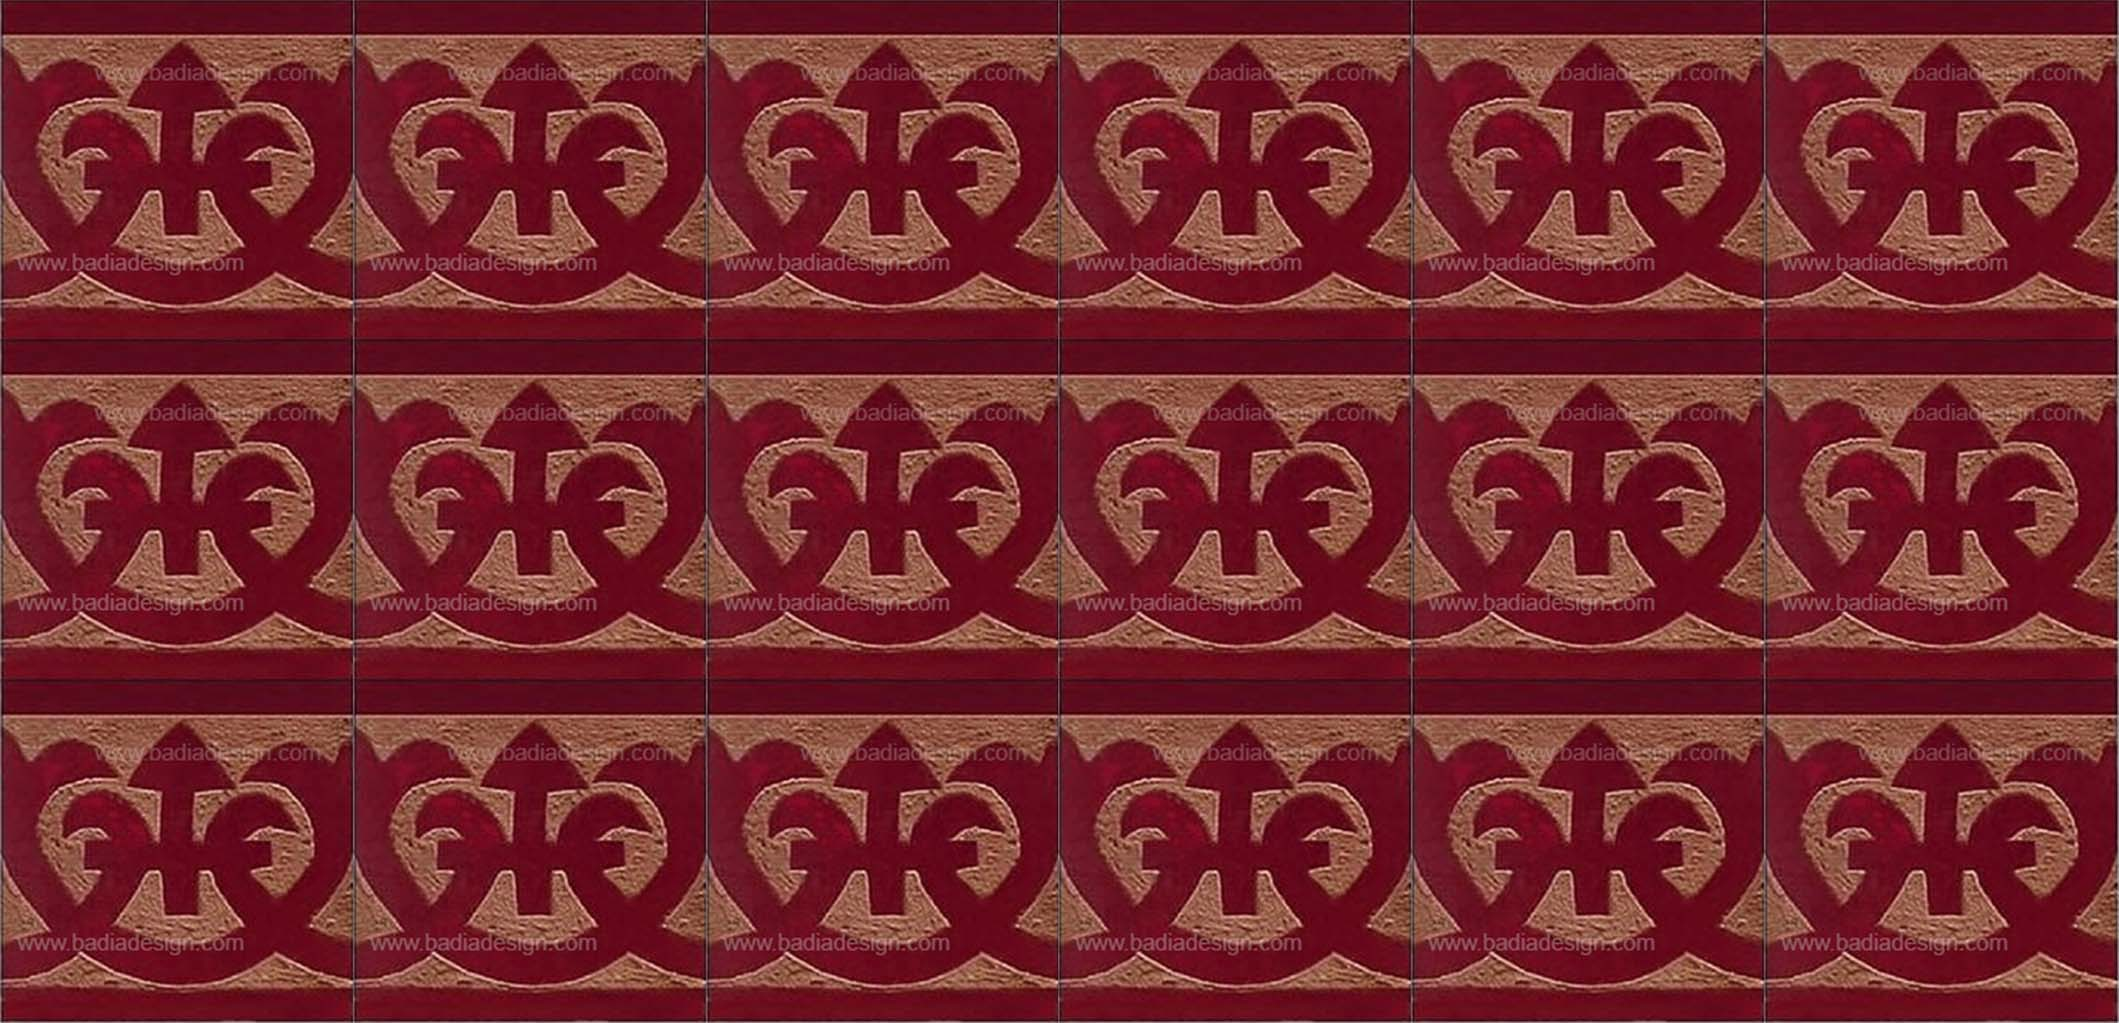 moroccan-hand-chiseled-tile-cht020-2.jpg